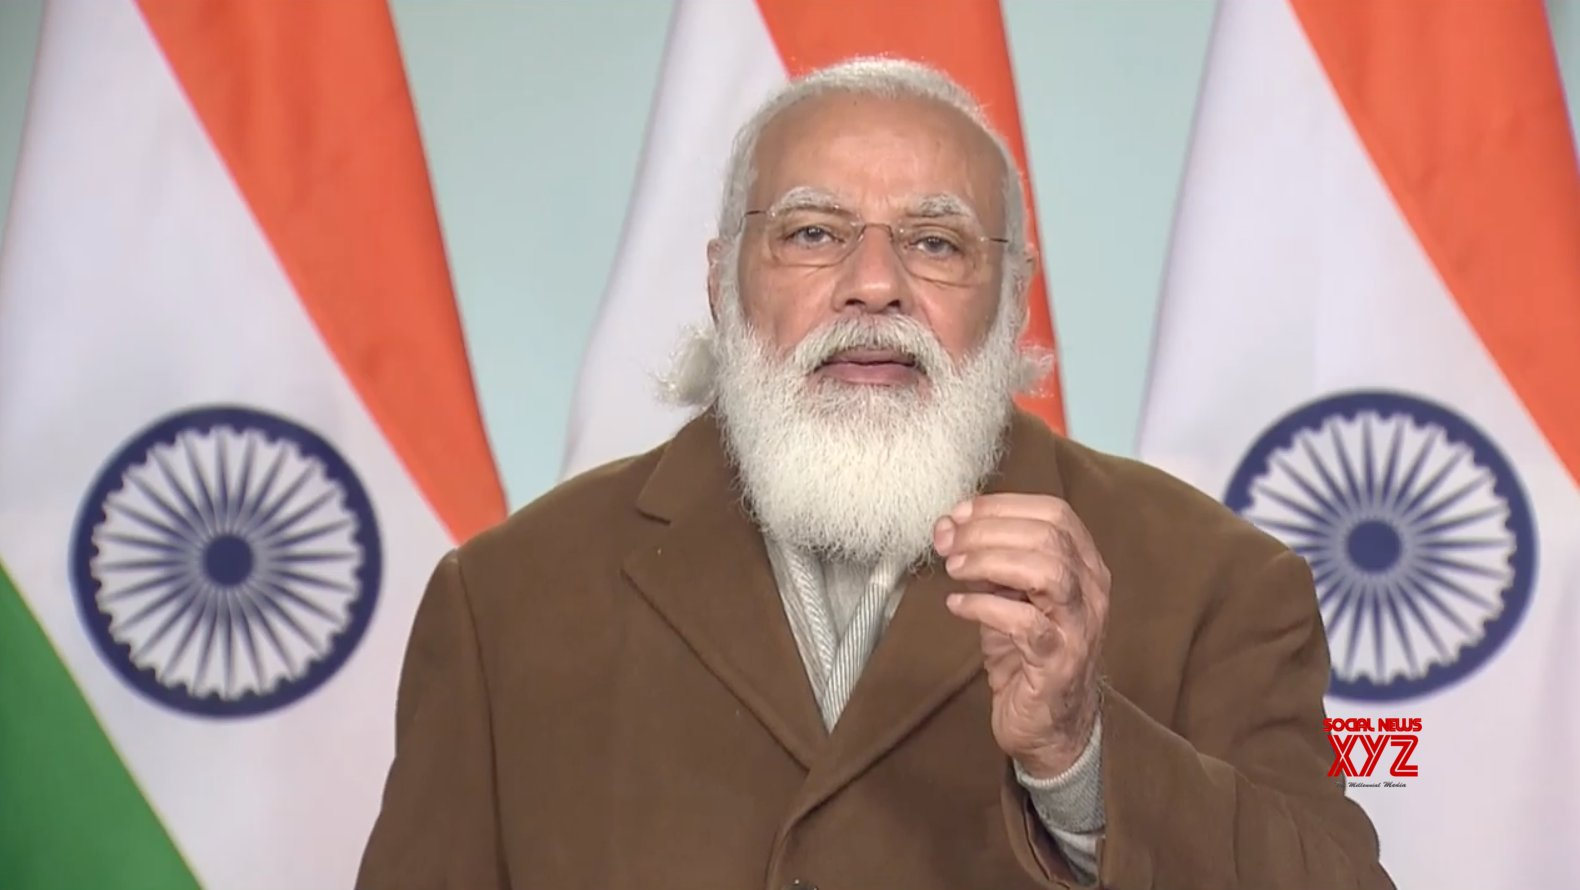 Makar Sankranti showcases India's vibrancy of traditions: PM